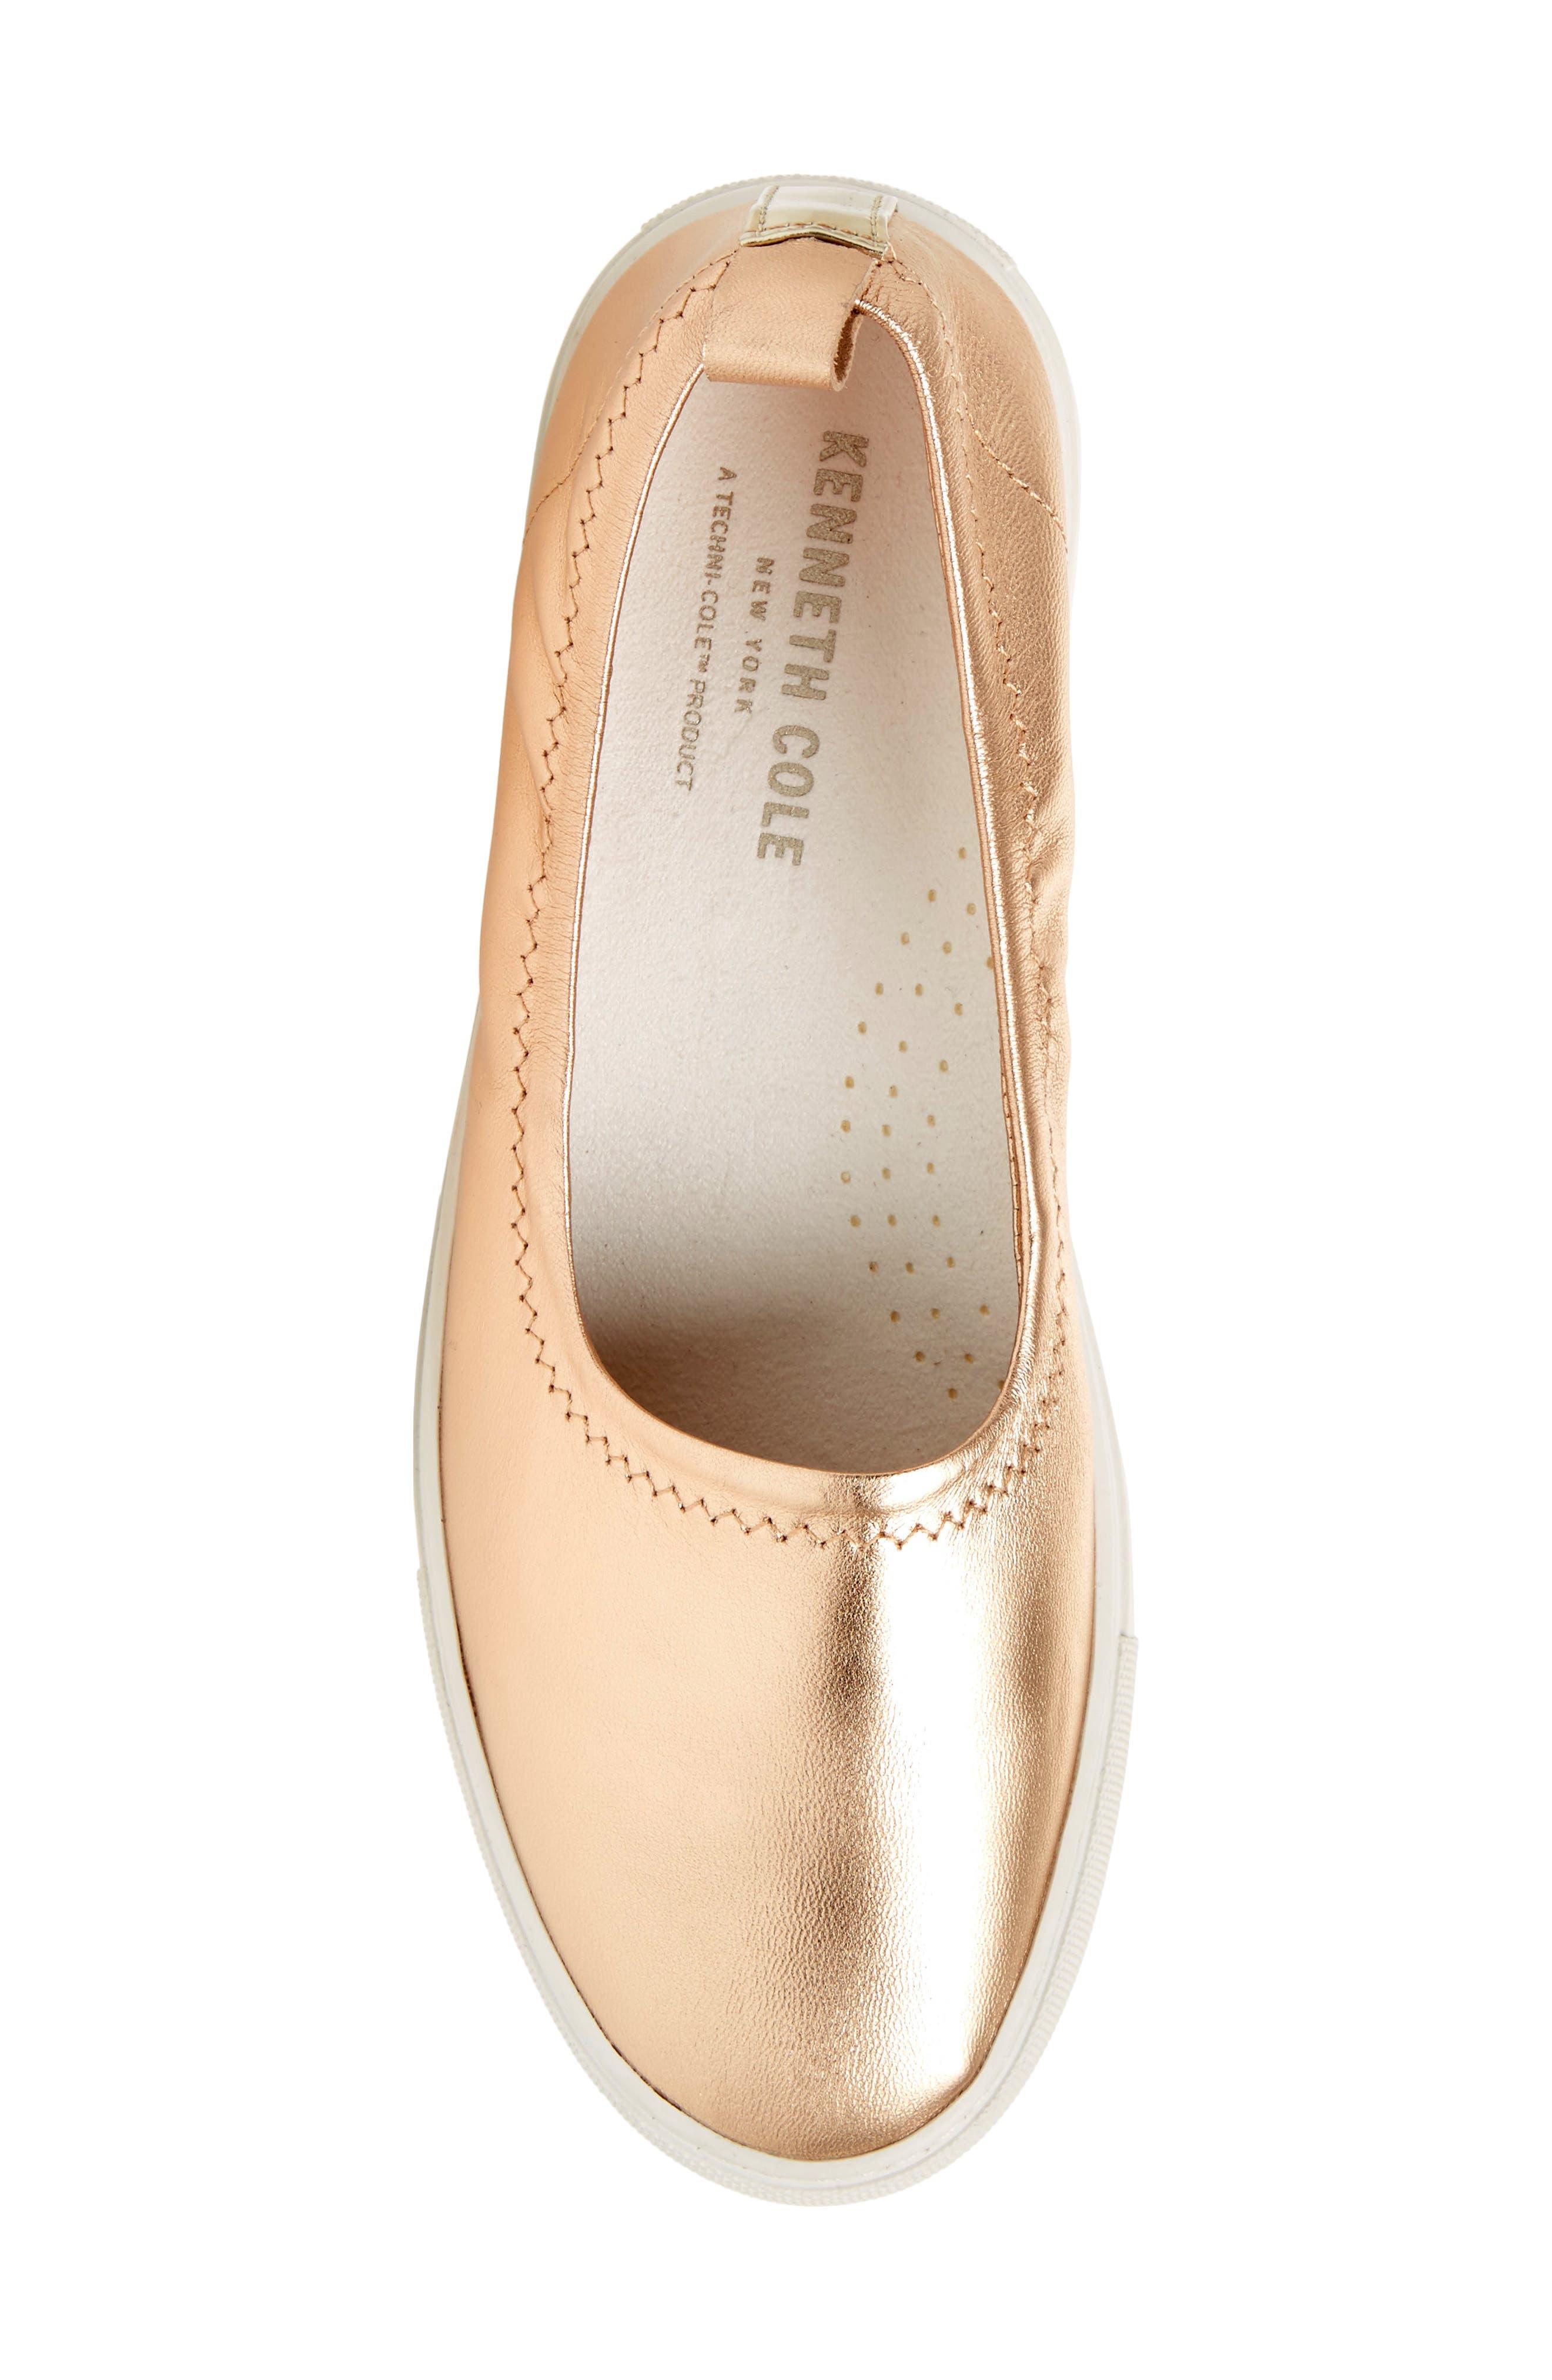 Kam Techni-Cole Ballet Flat,                             Alternate thumbnail 5, color,                             Rose Gold Leather